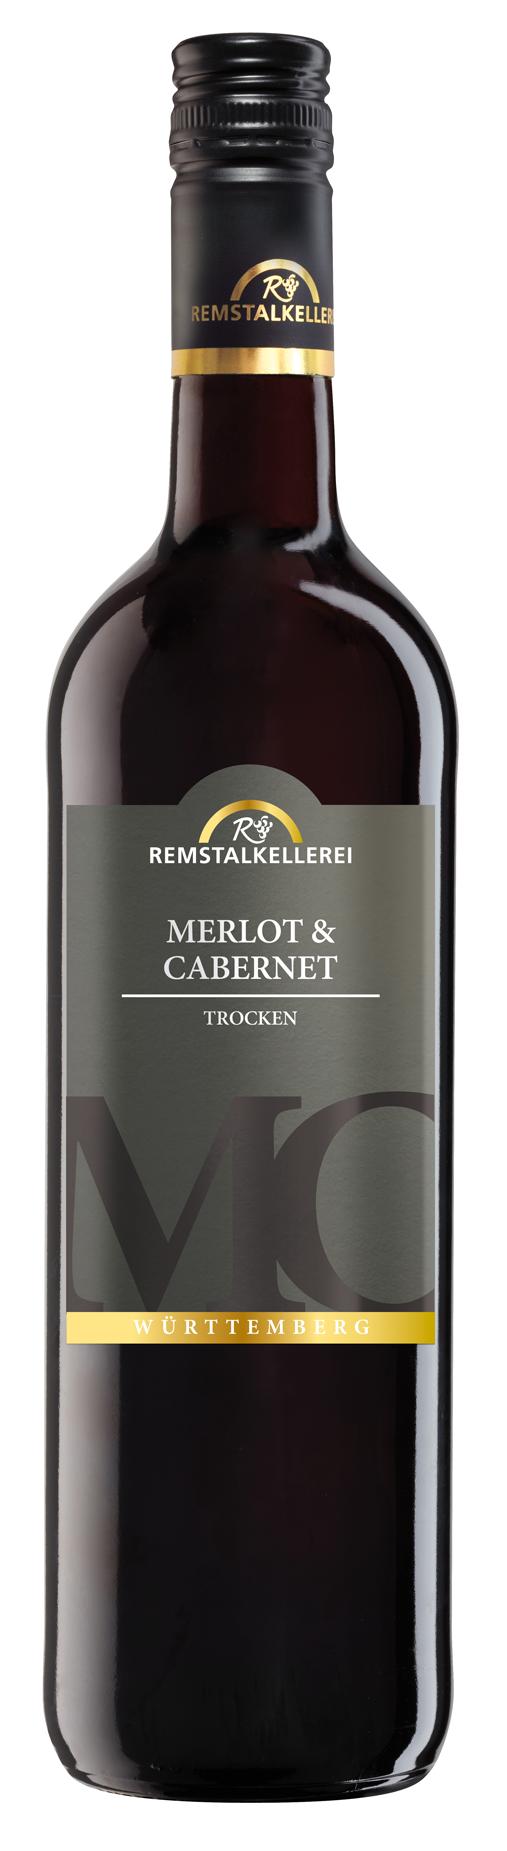 "Merlot & Cabernet ""MC"" trocken"